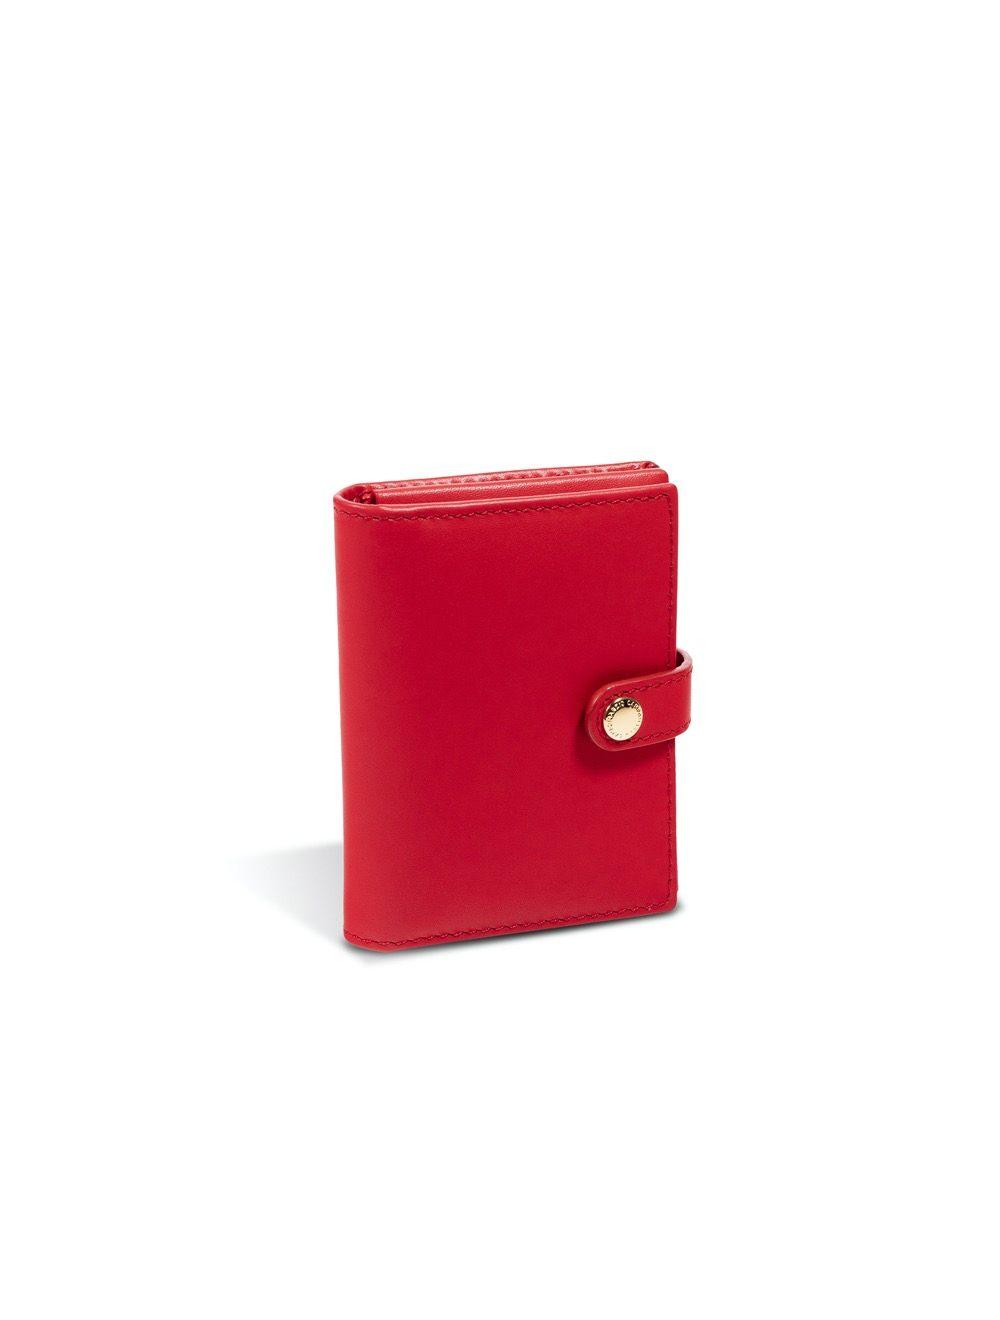 Romy Business Card Holder - Flame Scarlet